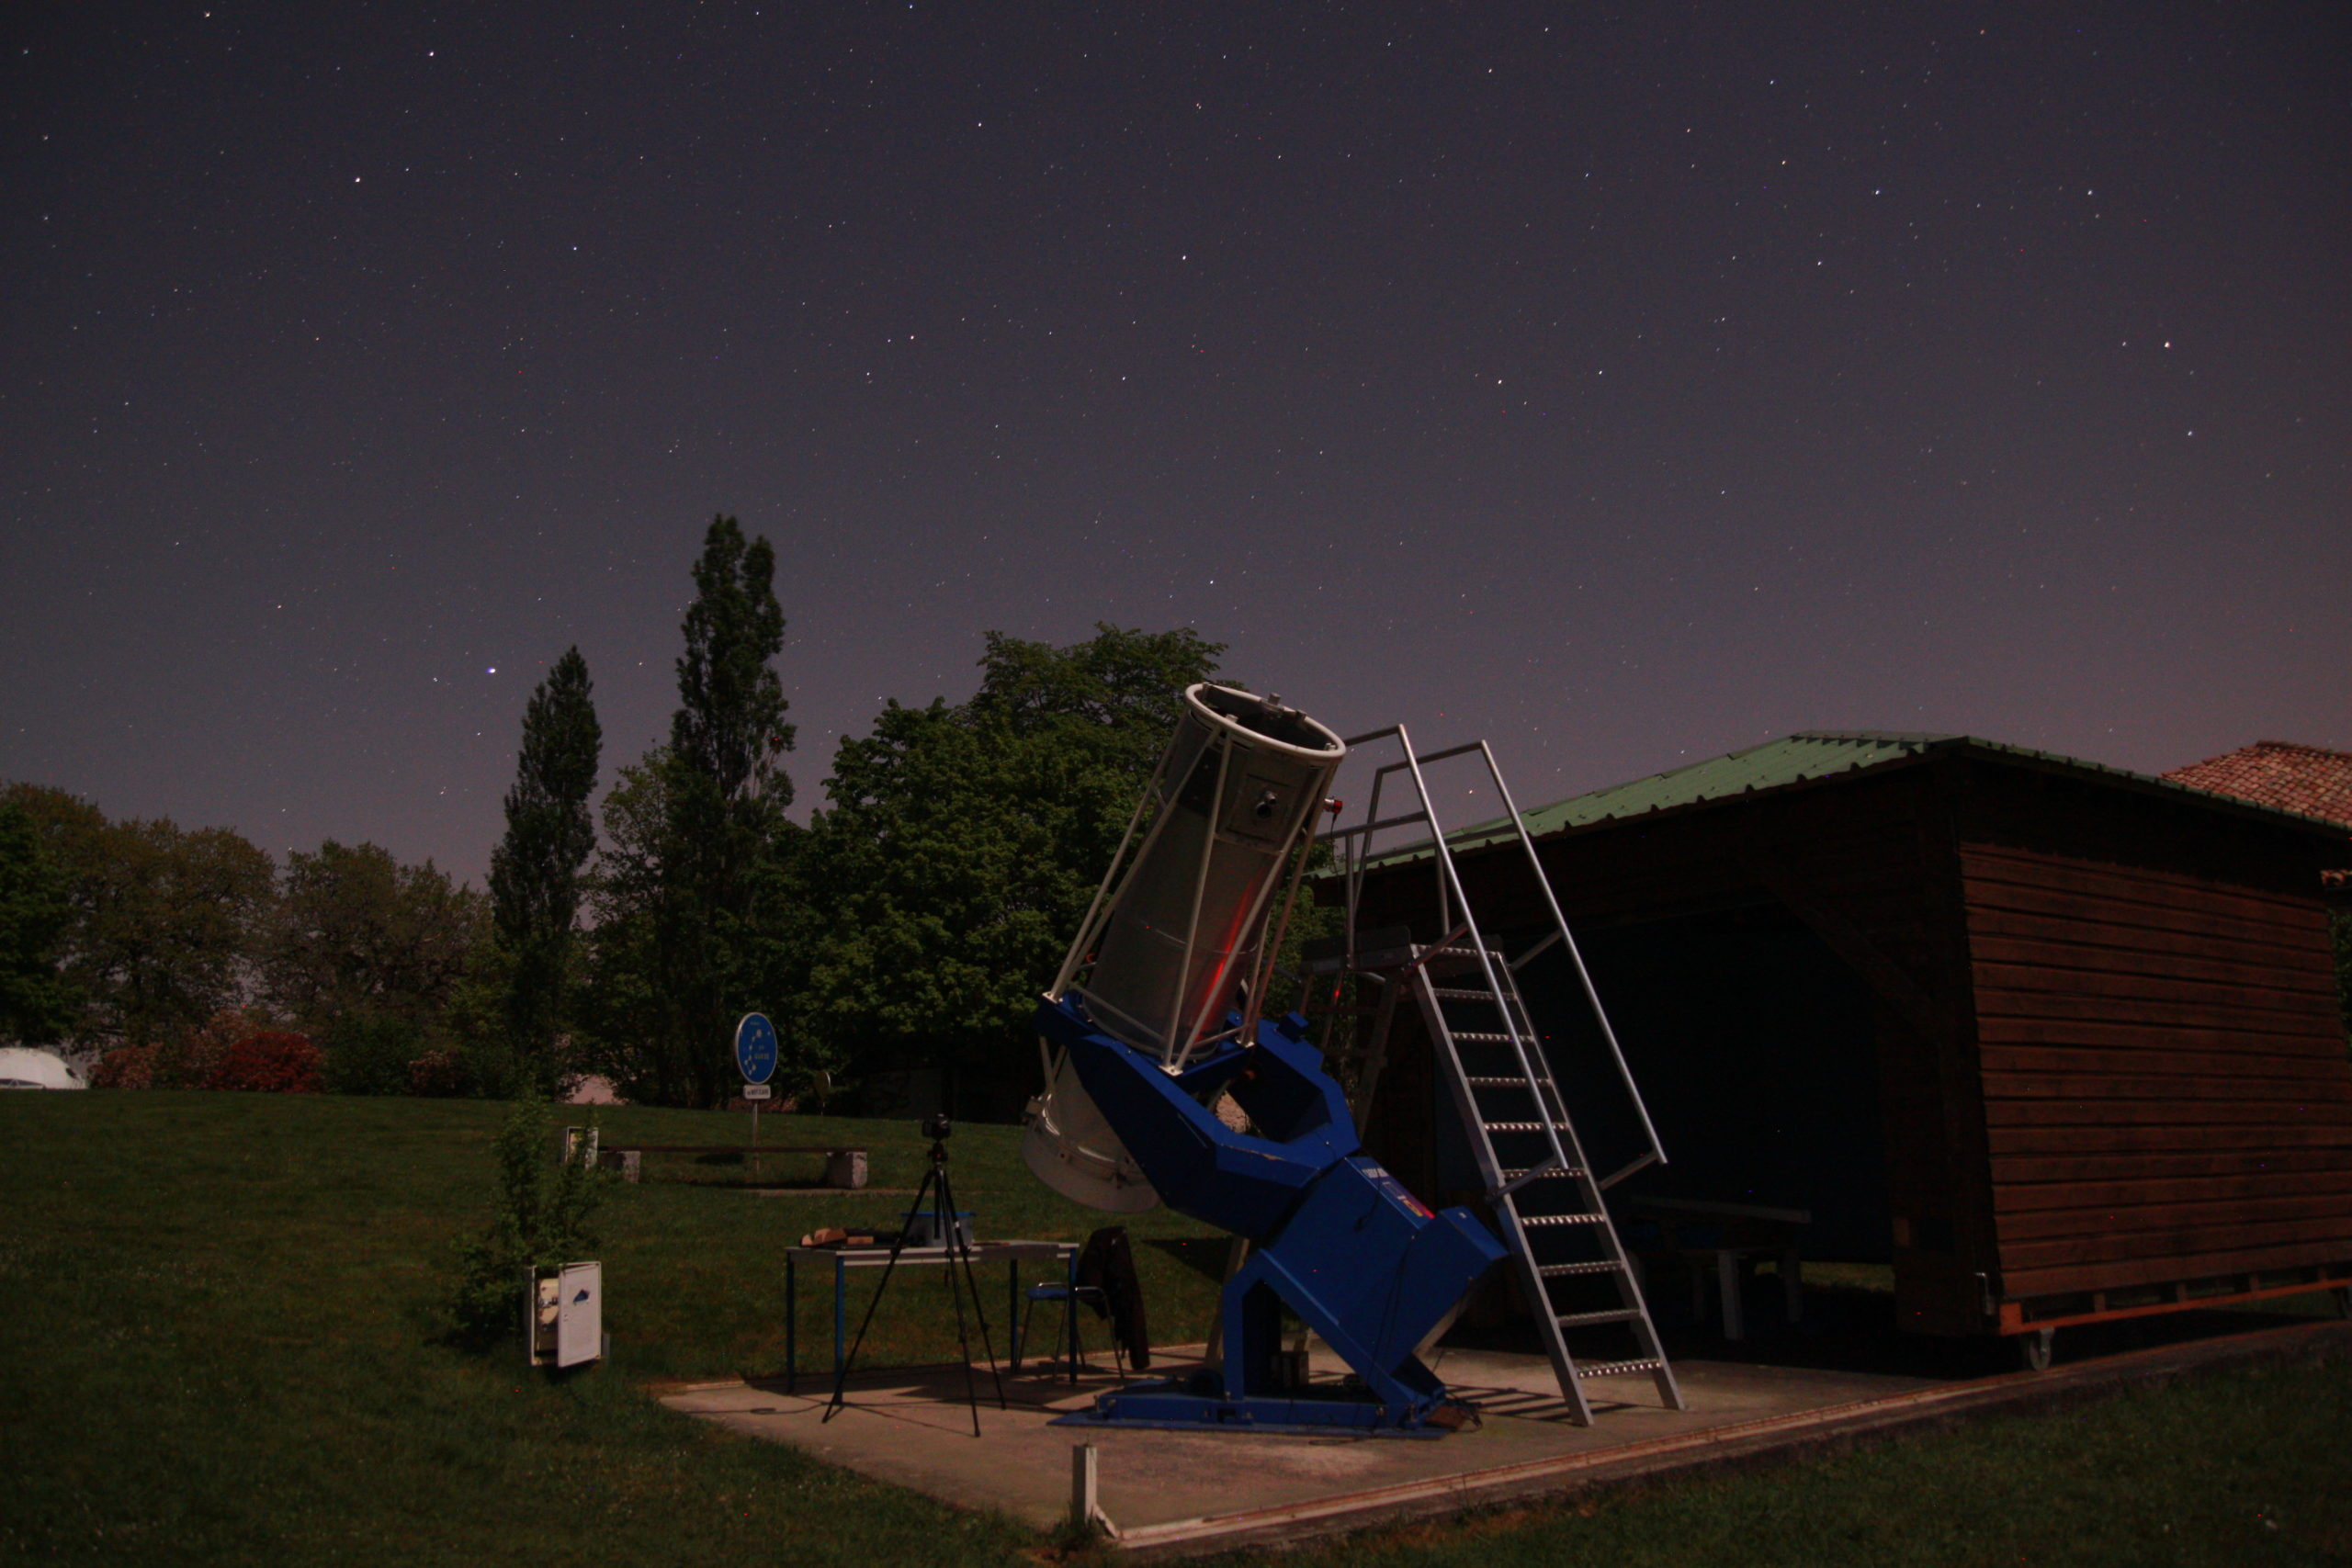 Nuits d'observations